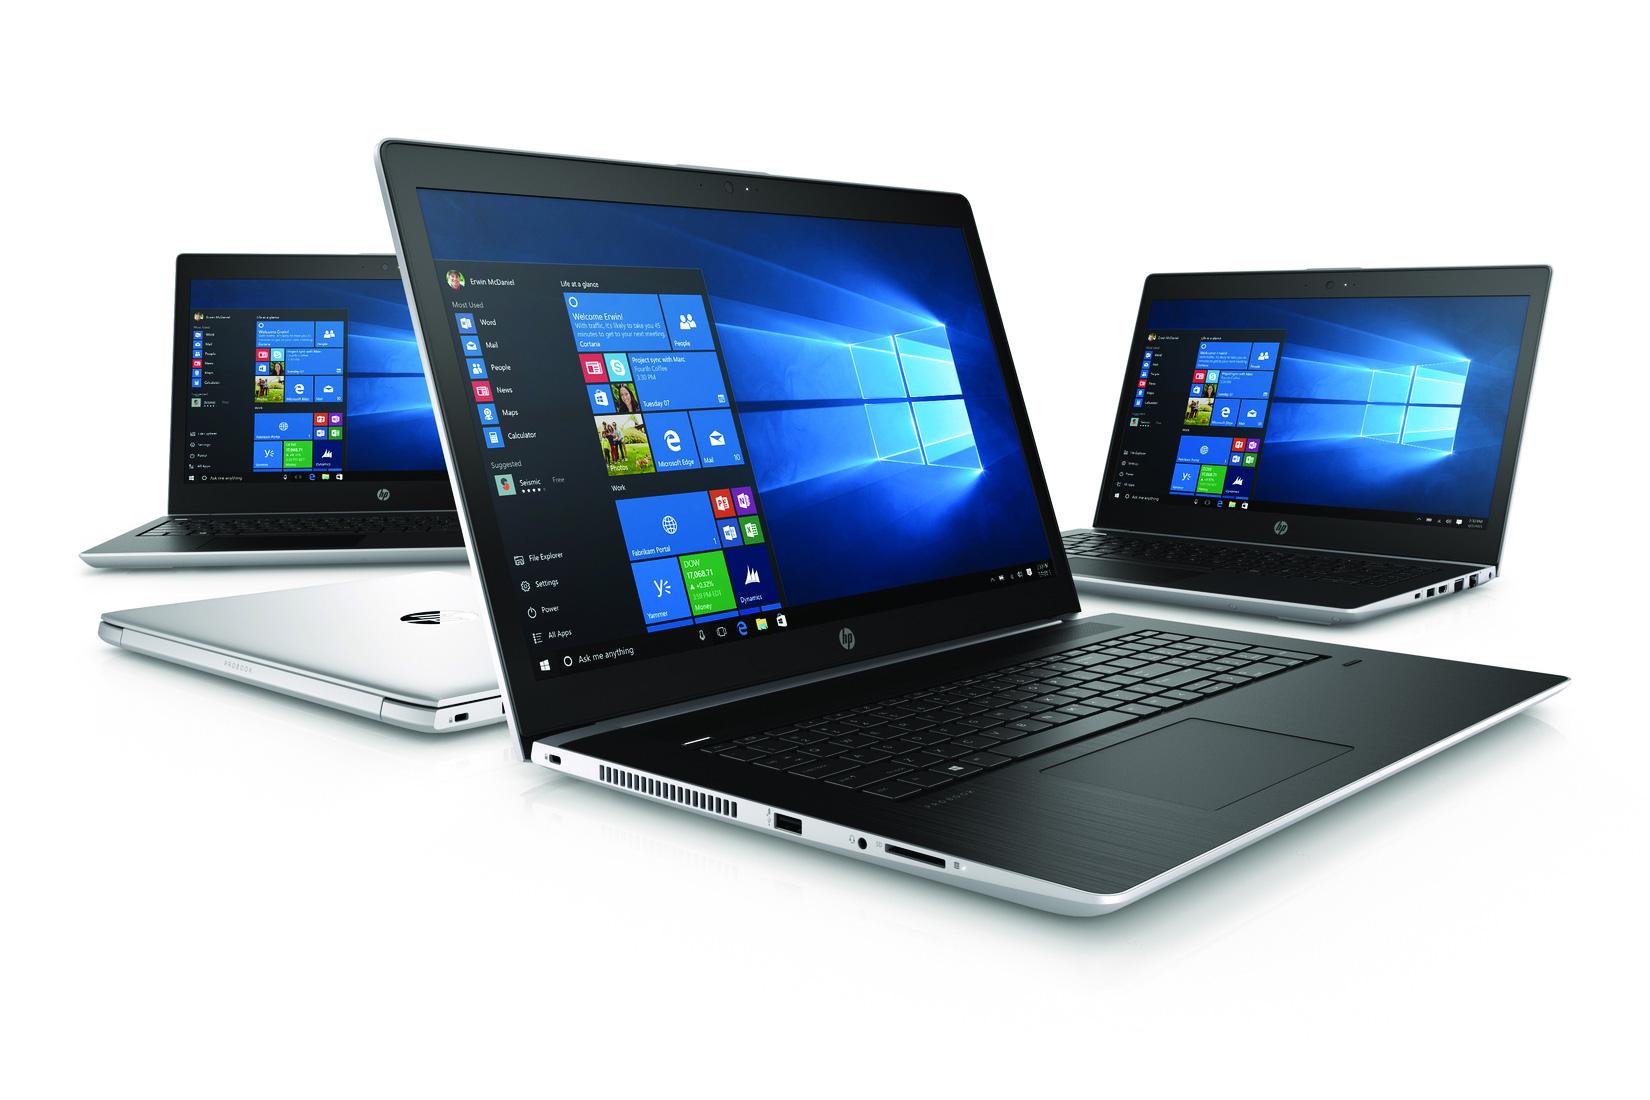 HP 250G7,i5, 8GB,500GB HDD+128GB SSD